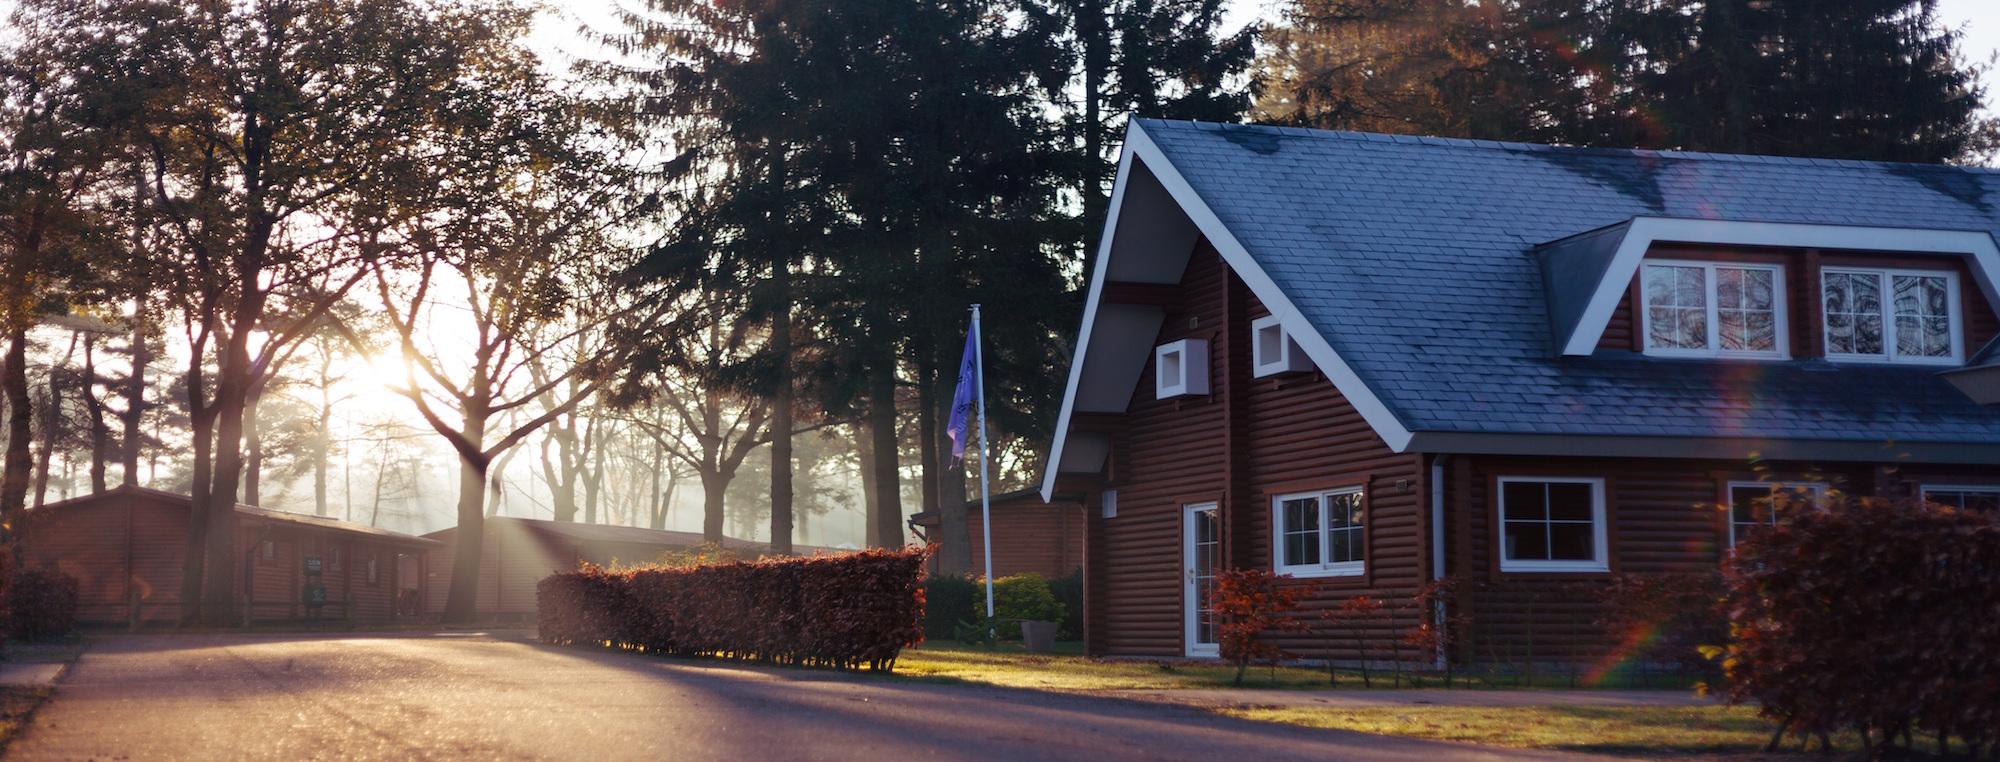 houses-1150022-3